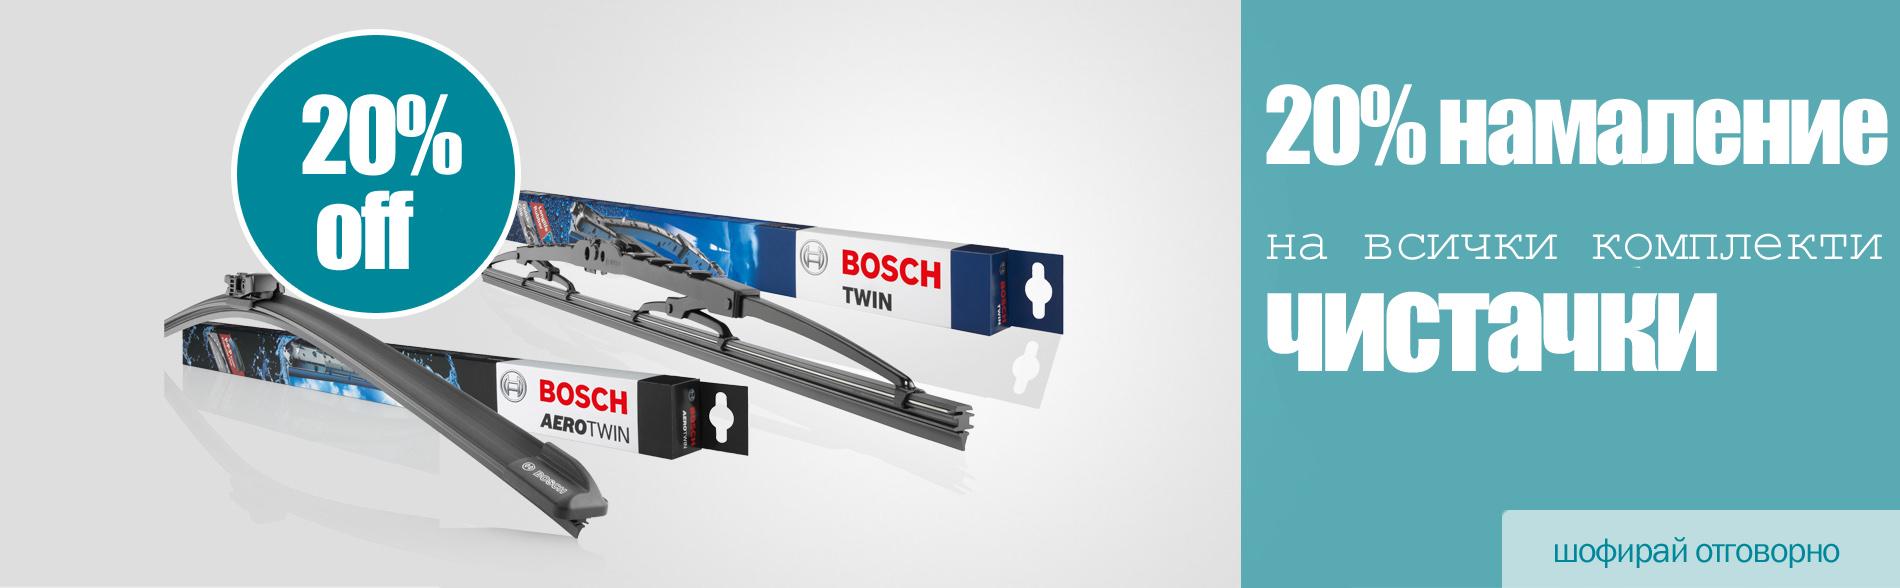 Оригинални чистачки Bosch от Oily.bg